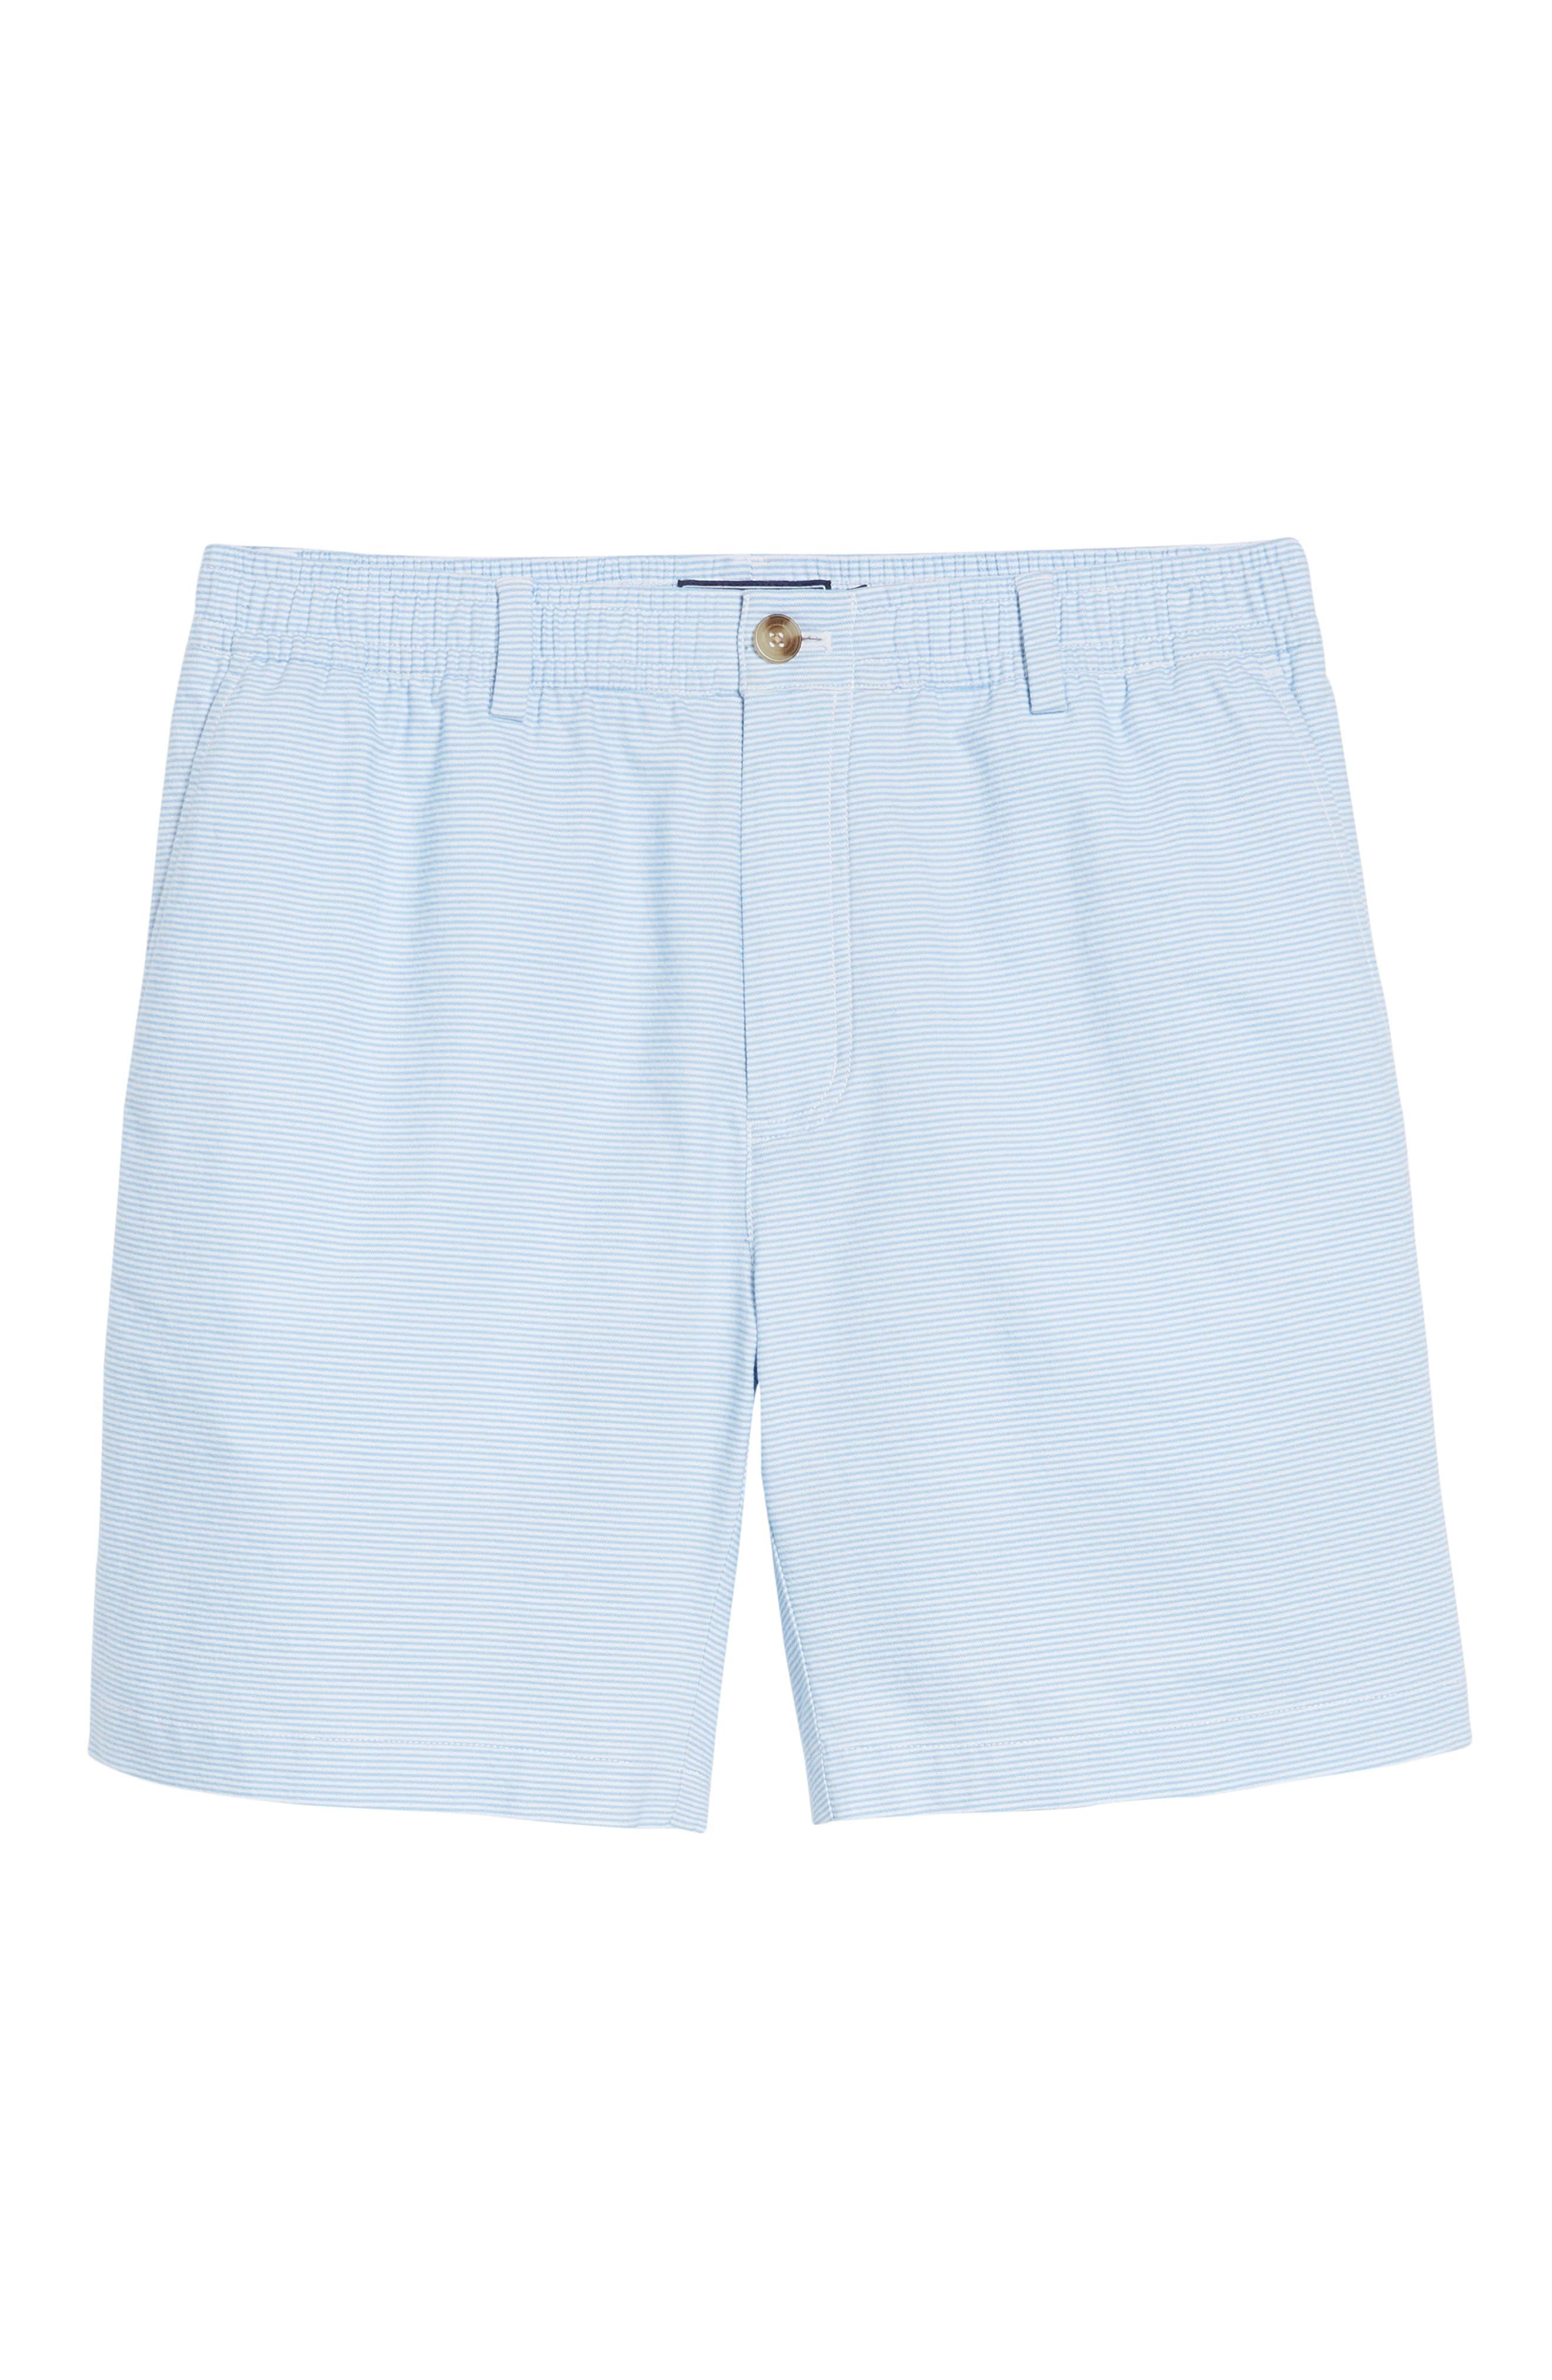 Jetty Stripe Stretch Cotton Shorts,                             Alternate thumbnail 6, color,                             Ocean Breeze